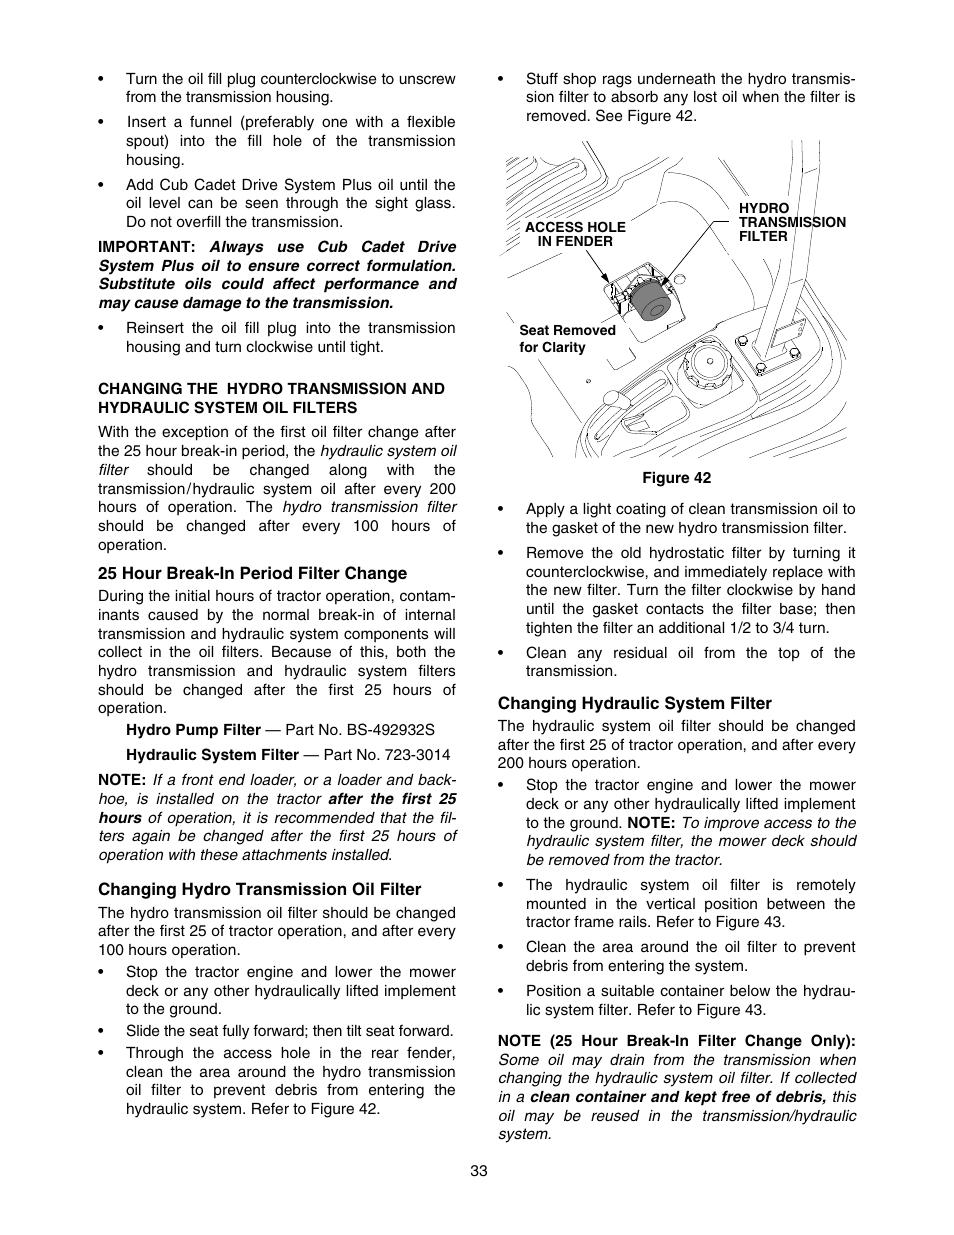 Cub Cadet 5252 User Manual   Page 33 / 56